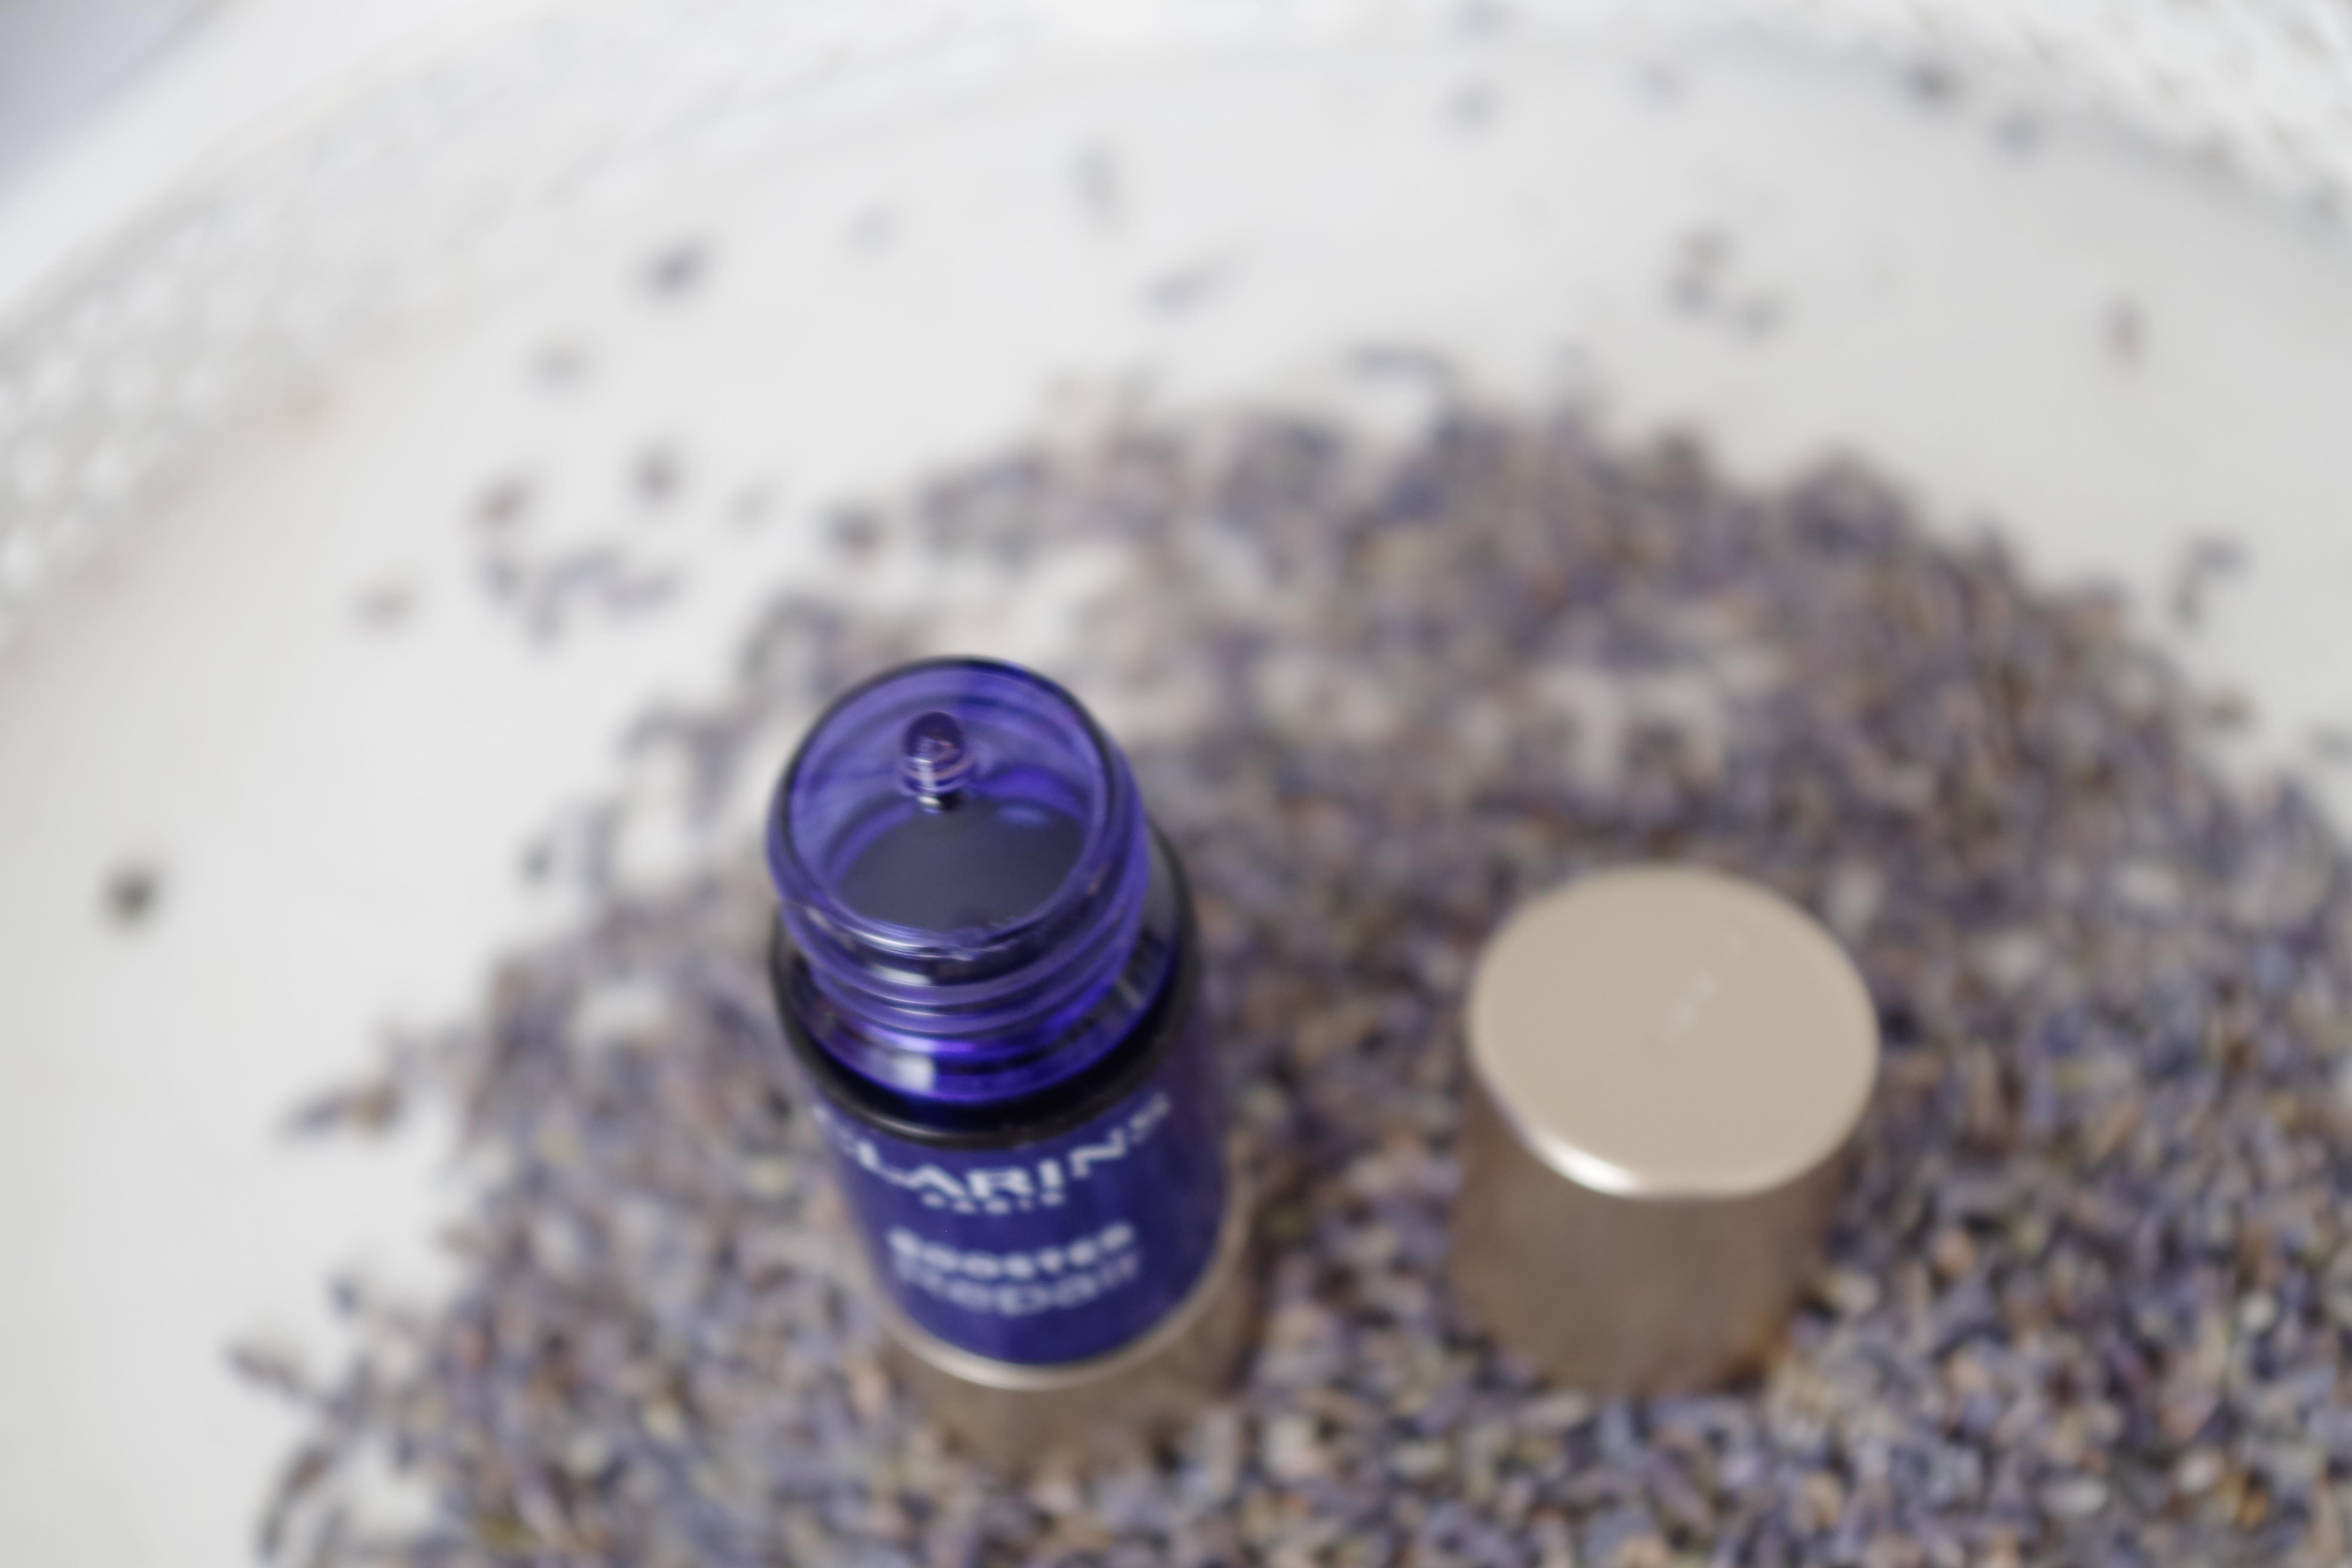 Clarins Hautpflege Booster Repair Repairbooster Serum Mixnmatch selbstmischen Makeupjungle-002